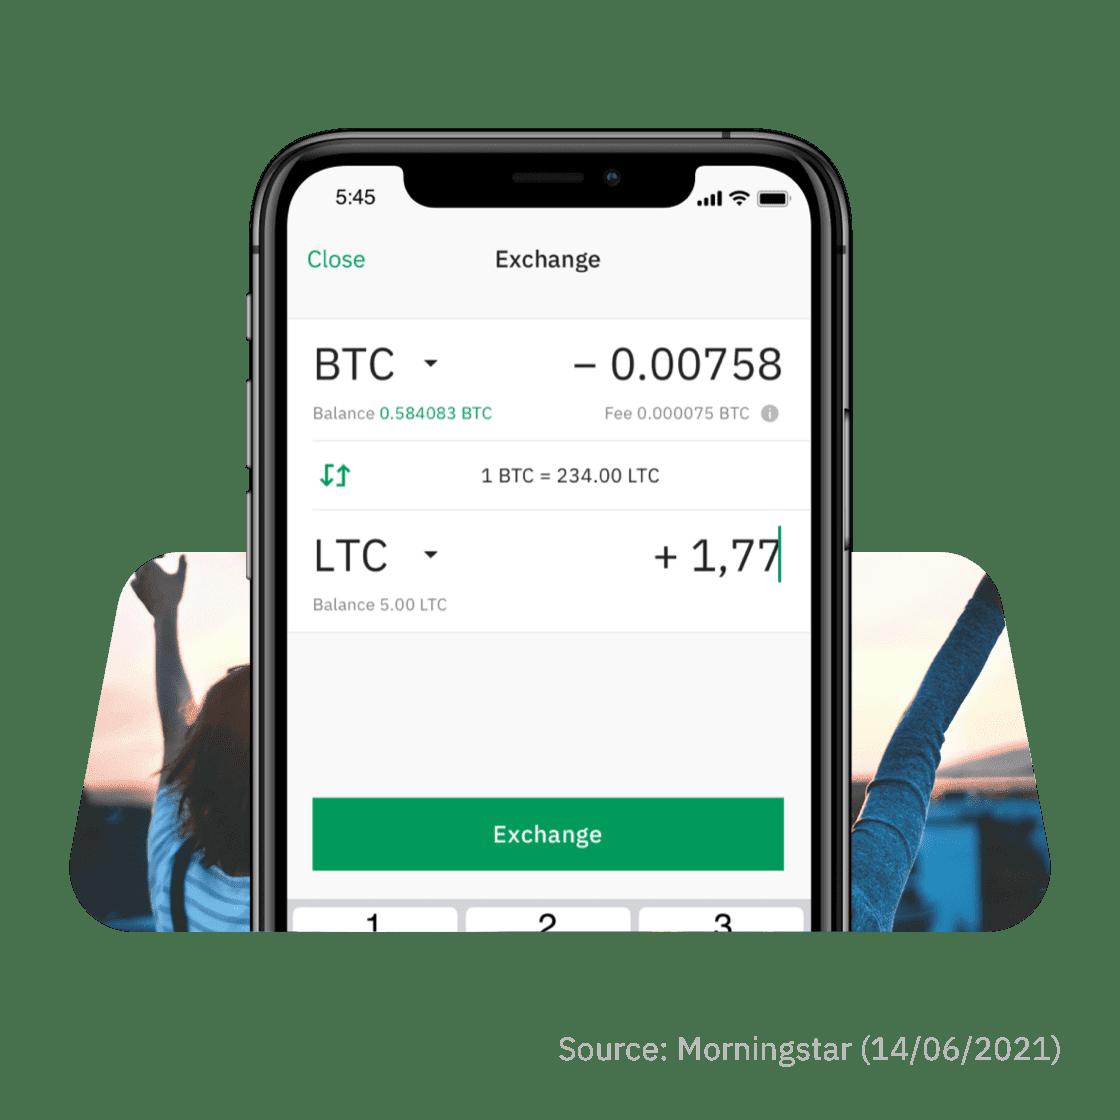 Exchanges*